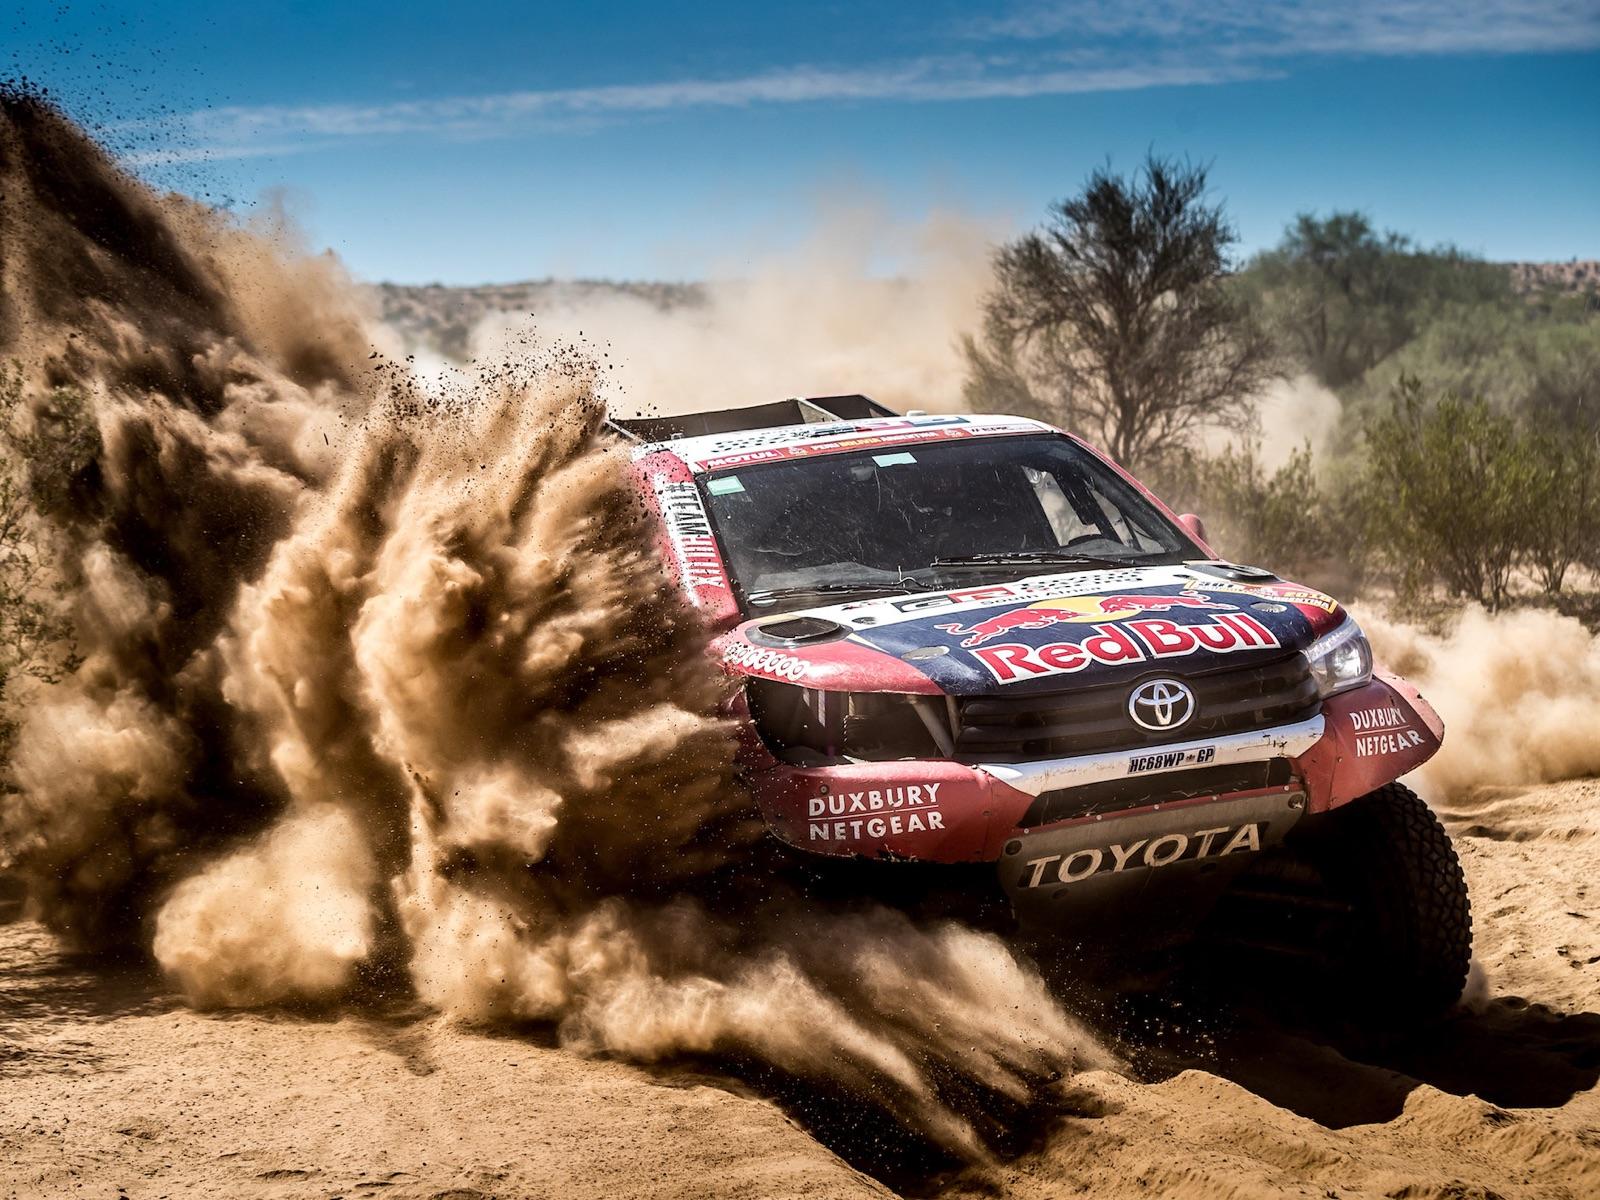 toyota hilux Dakar 2019